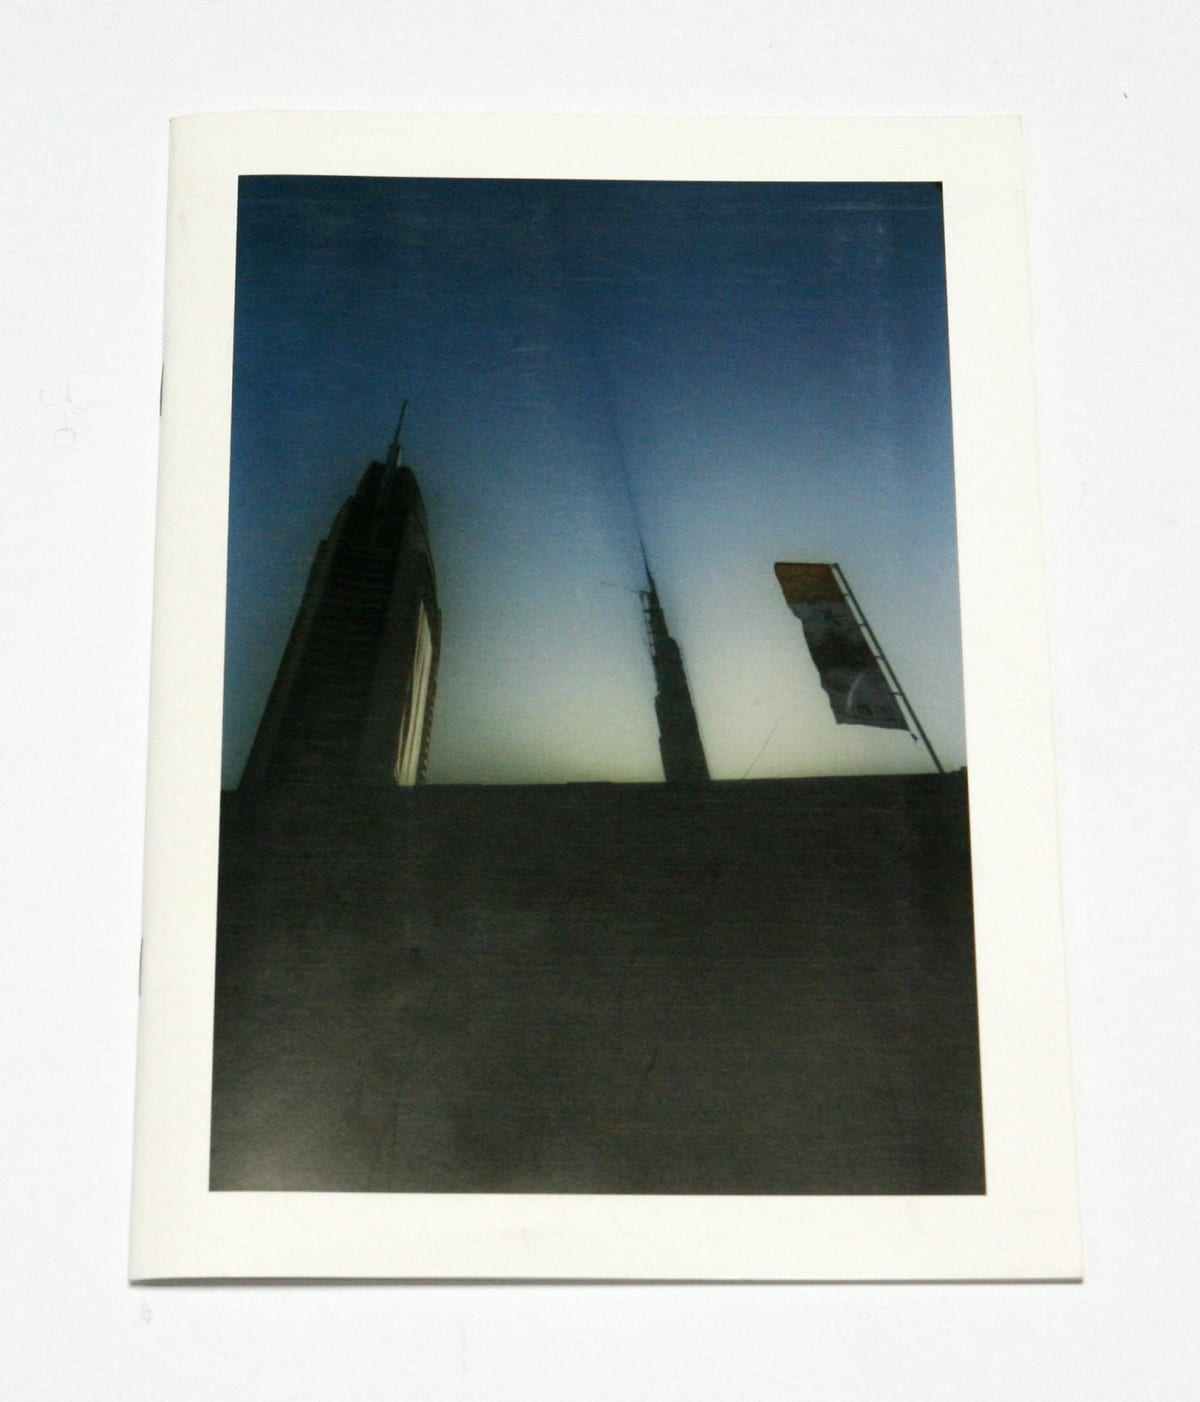 Asako Narahashi 2009/1989: Coming Closer and Getting Further Away